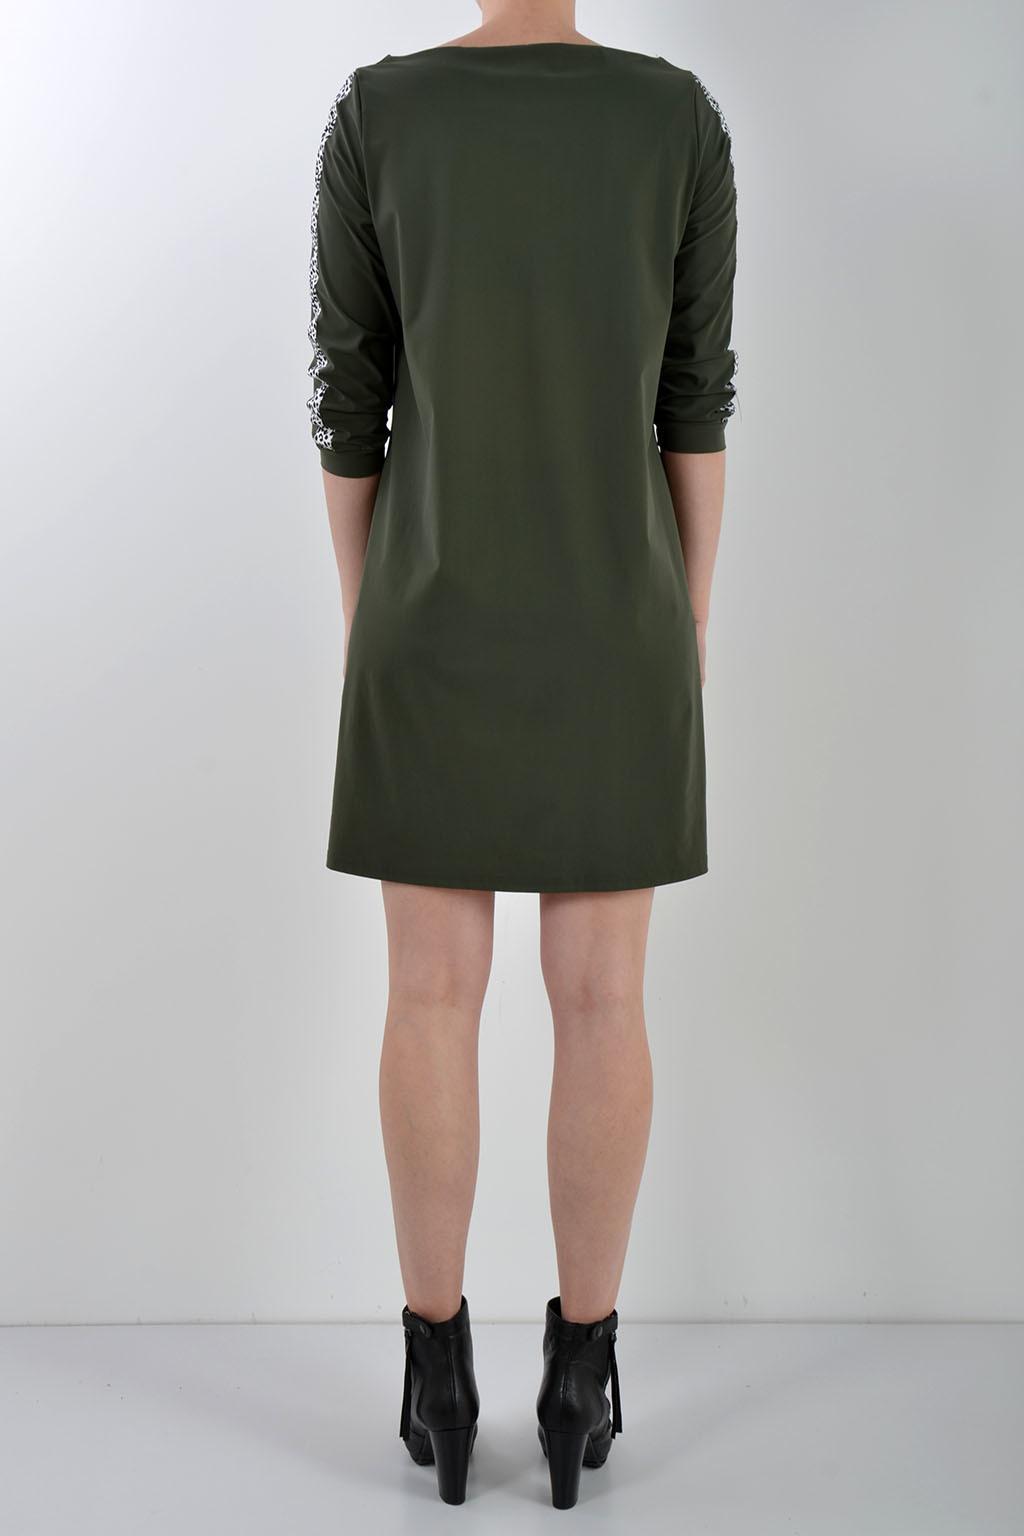 ec1597158b3977 ... Studio anneloes flex tape jurk groen - Studio Anneloes